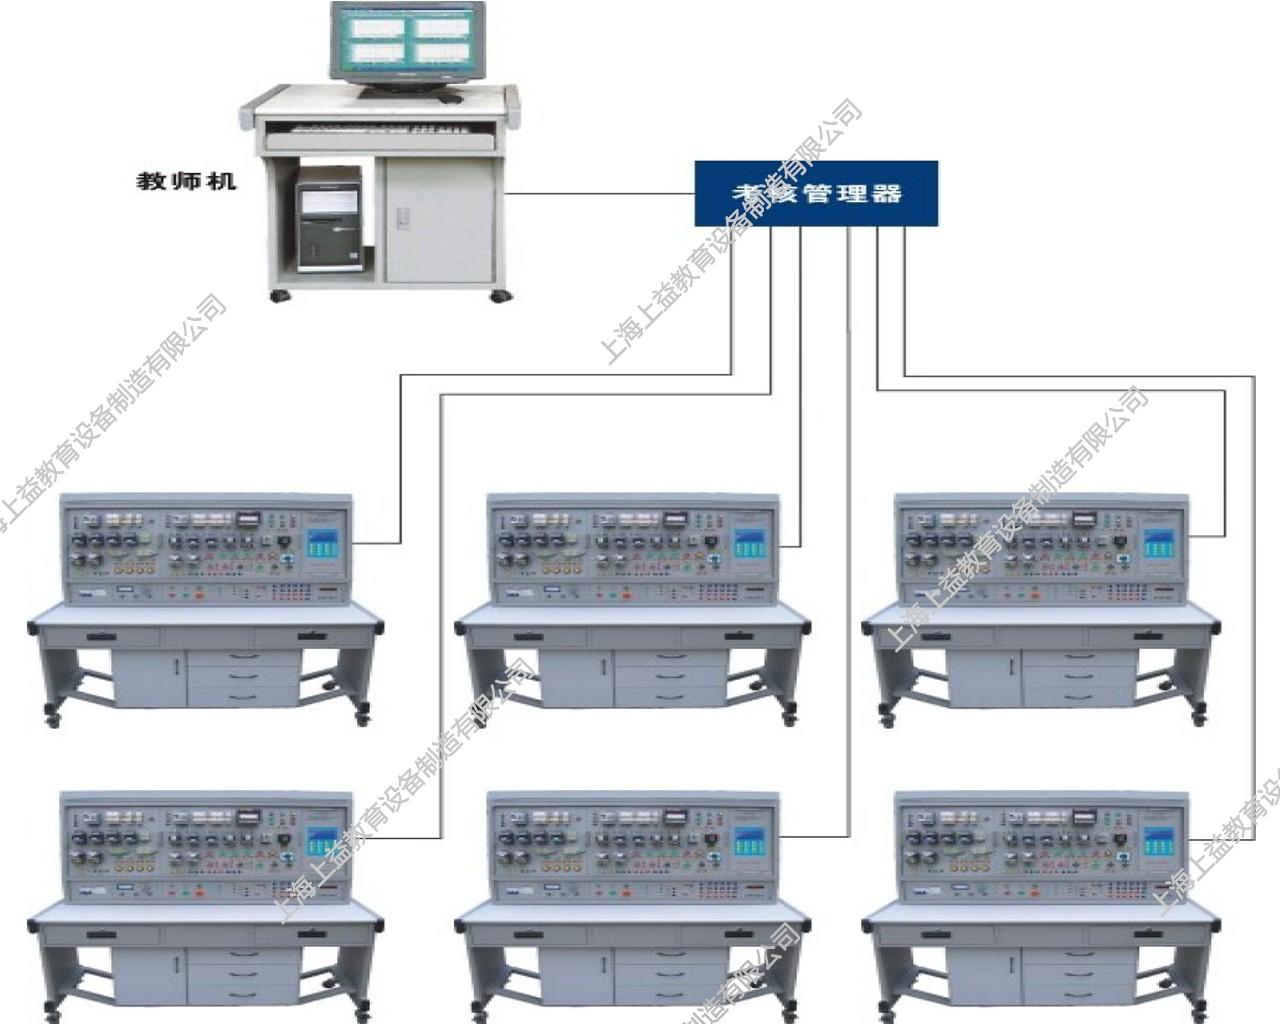 SYWLJ-07A无线网络化智能型机床电气技能wwwlehu8viplehu68vip装置